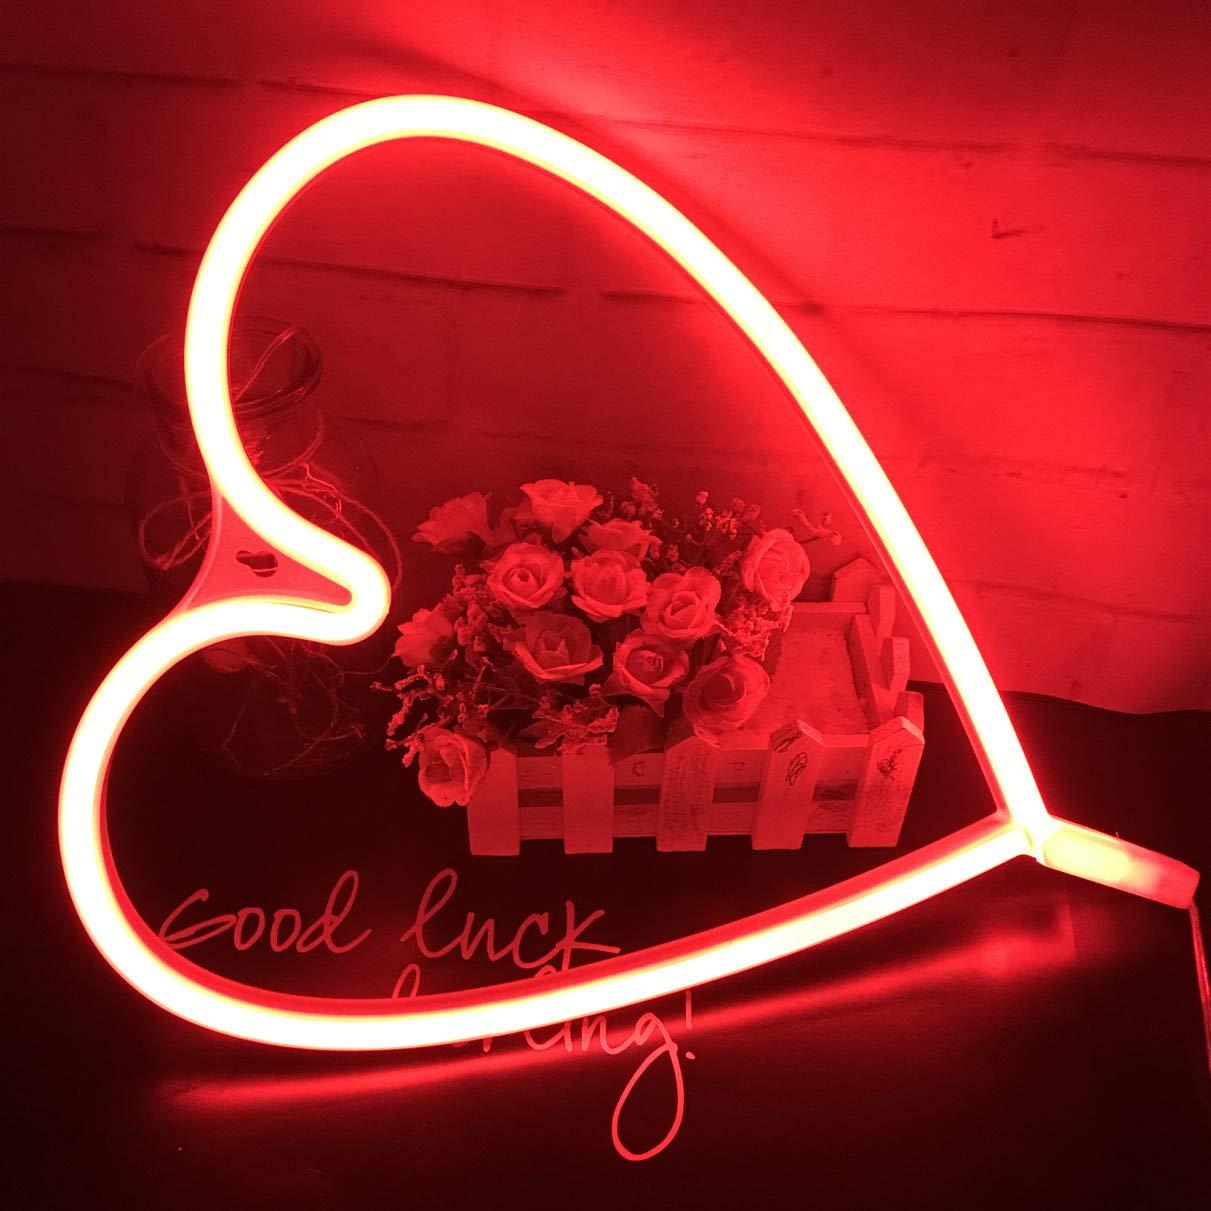 Neon Light,LED Lightning Sign Shaped Decor Light,Wall Decor for Christmas,Birthday party,Kids Room Living Room Wedding Party Decor blue